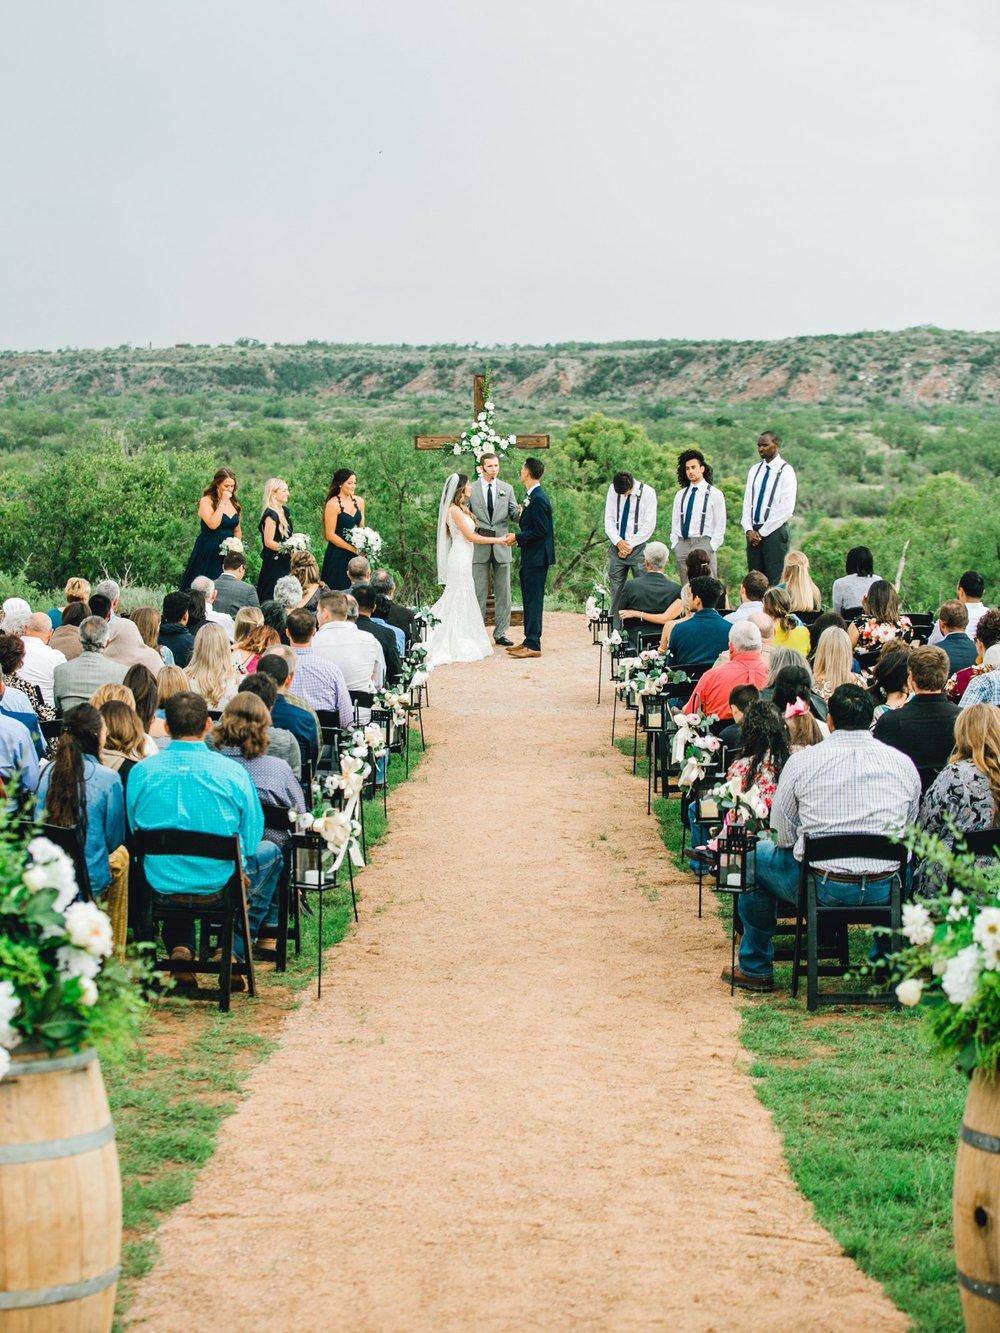 Ashley_John_English_Elegant_Texas_Wedding_Outdoors_Ranch_Caprock_Winery_ALLEEJ_0128.jpg